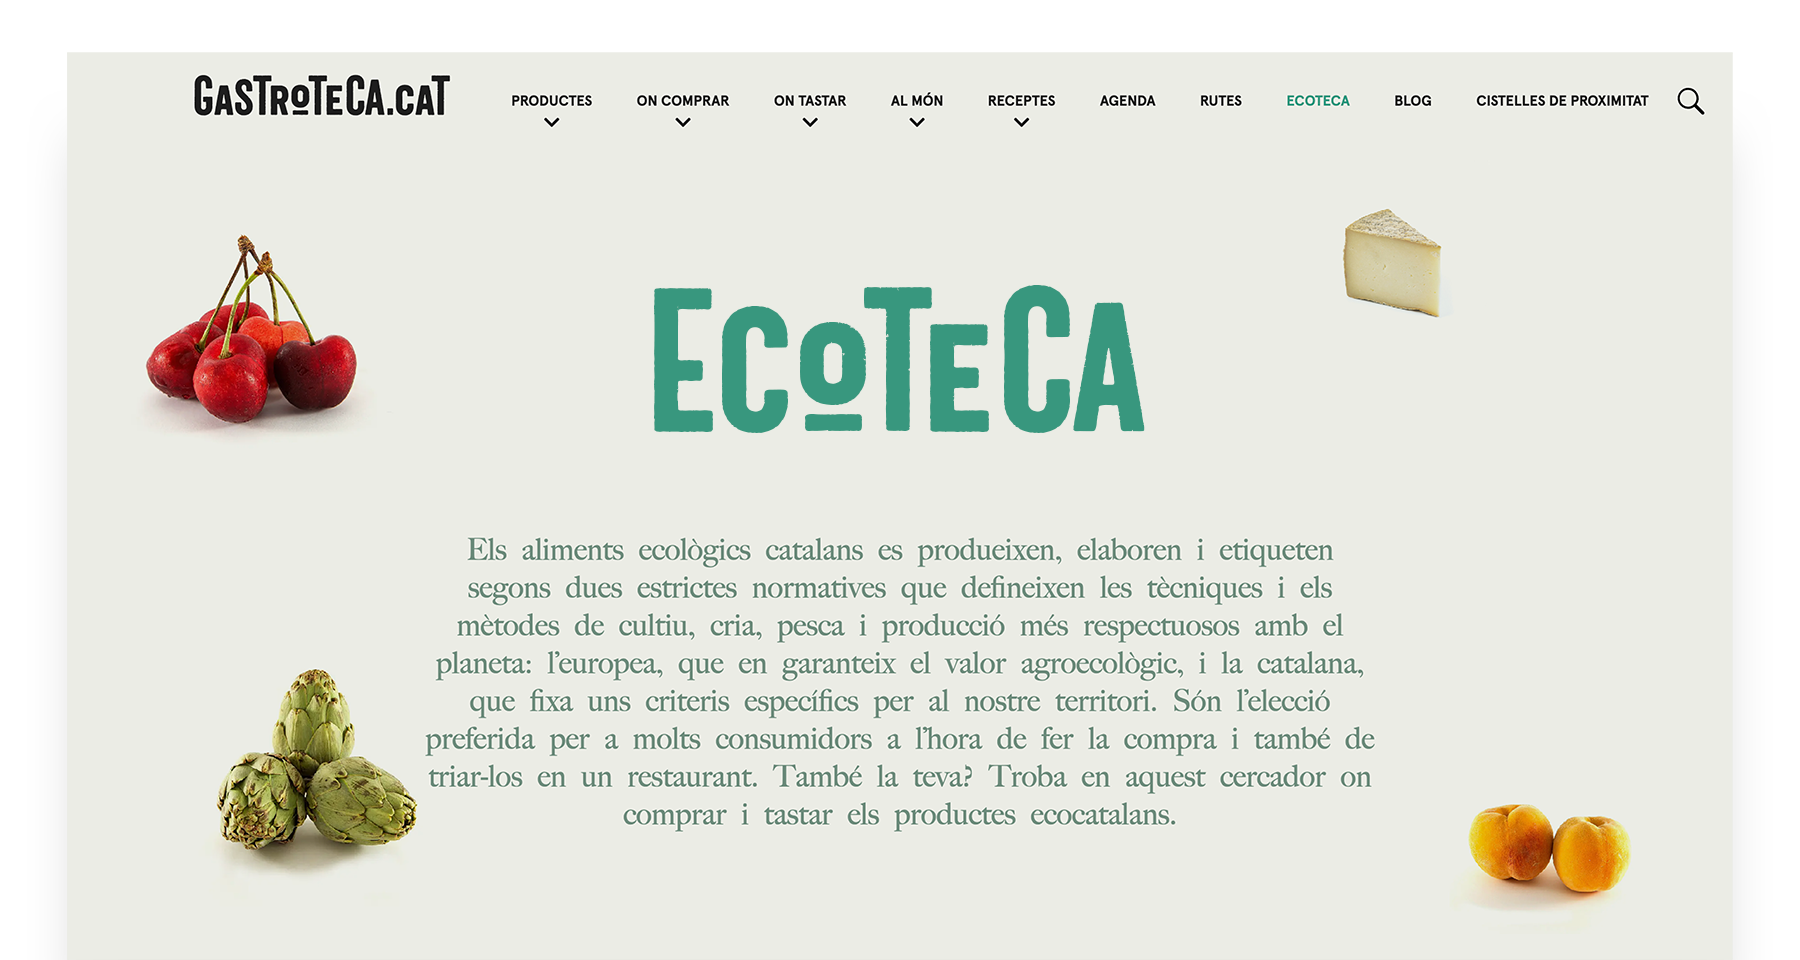 Logotipo y web Ecoteca por monsieur madame